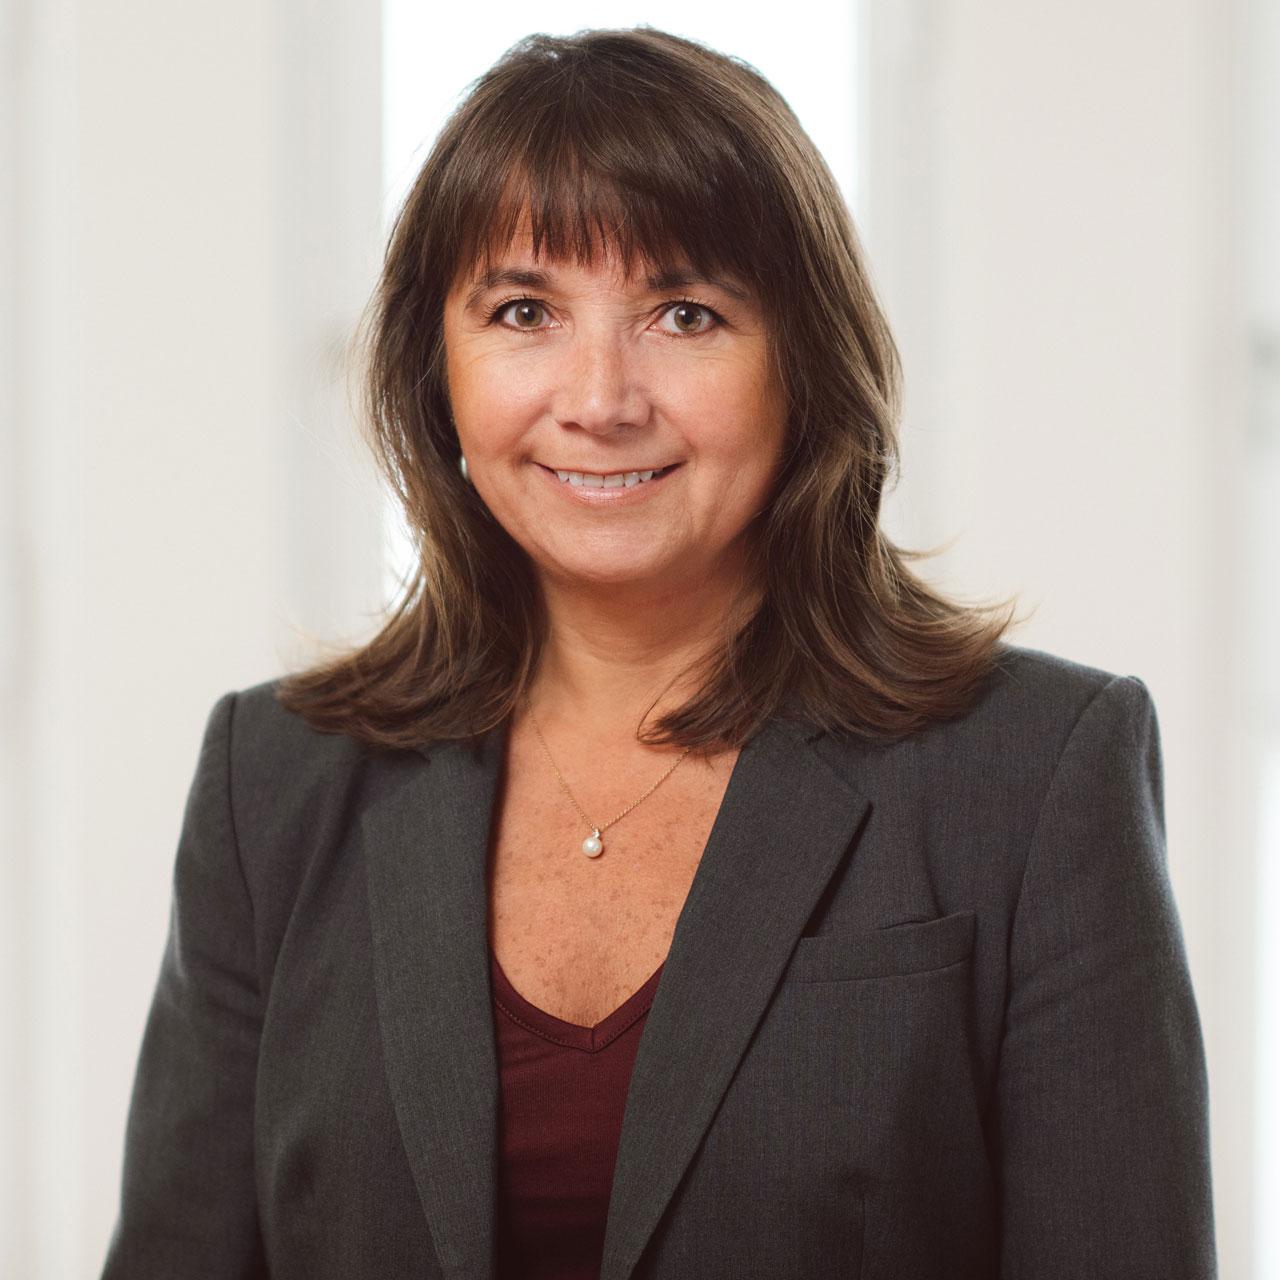 Angela Sundstrom